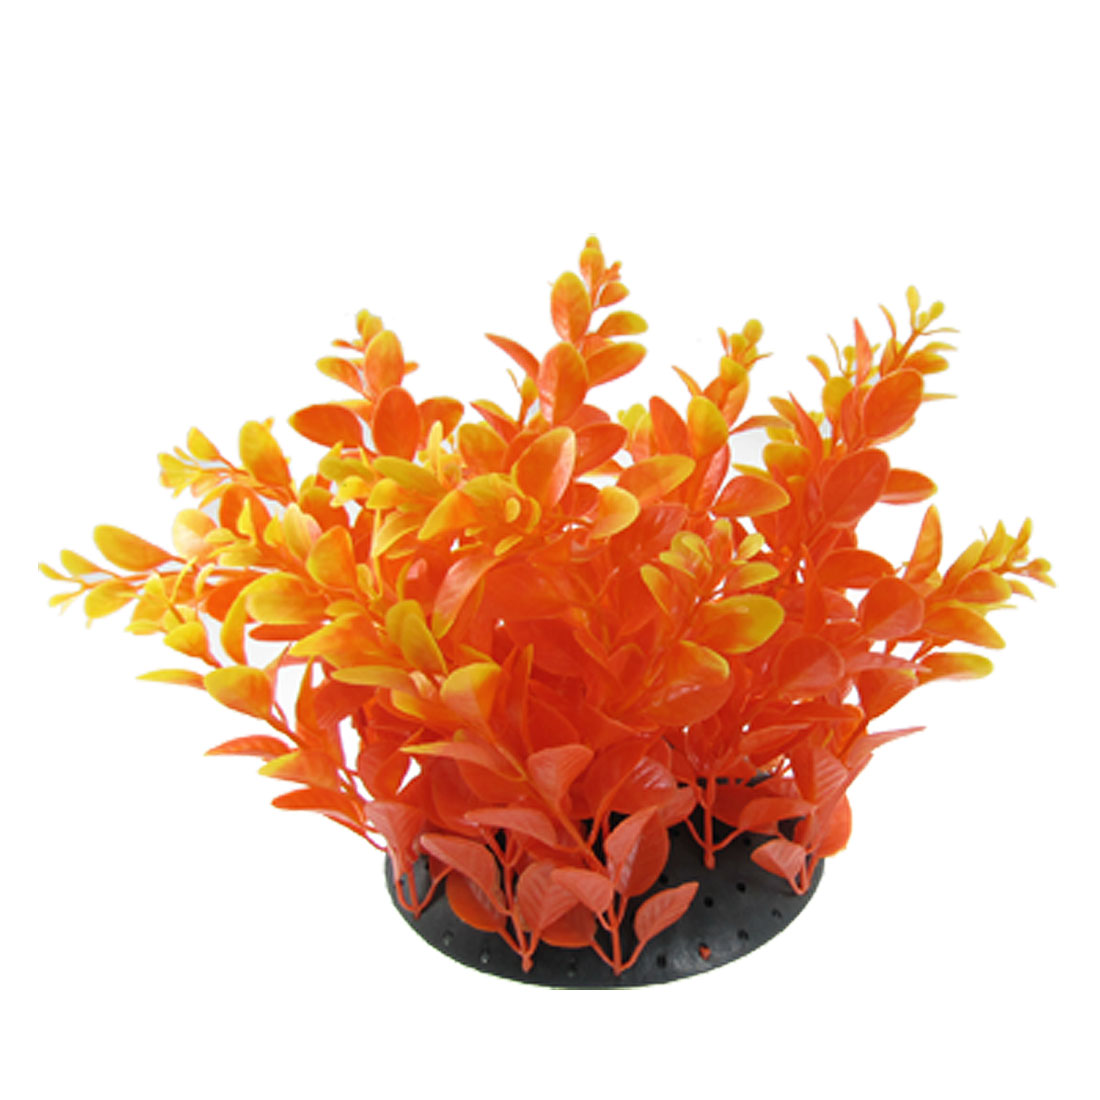 "Fish Tank Plastic Yellow Orange Aquascaping Plants Decor 7.8"" Height"